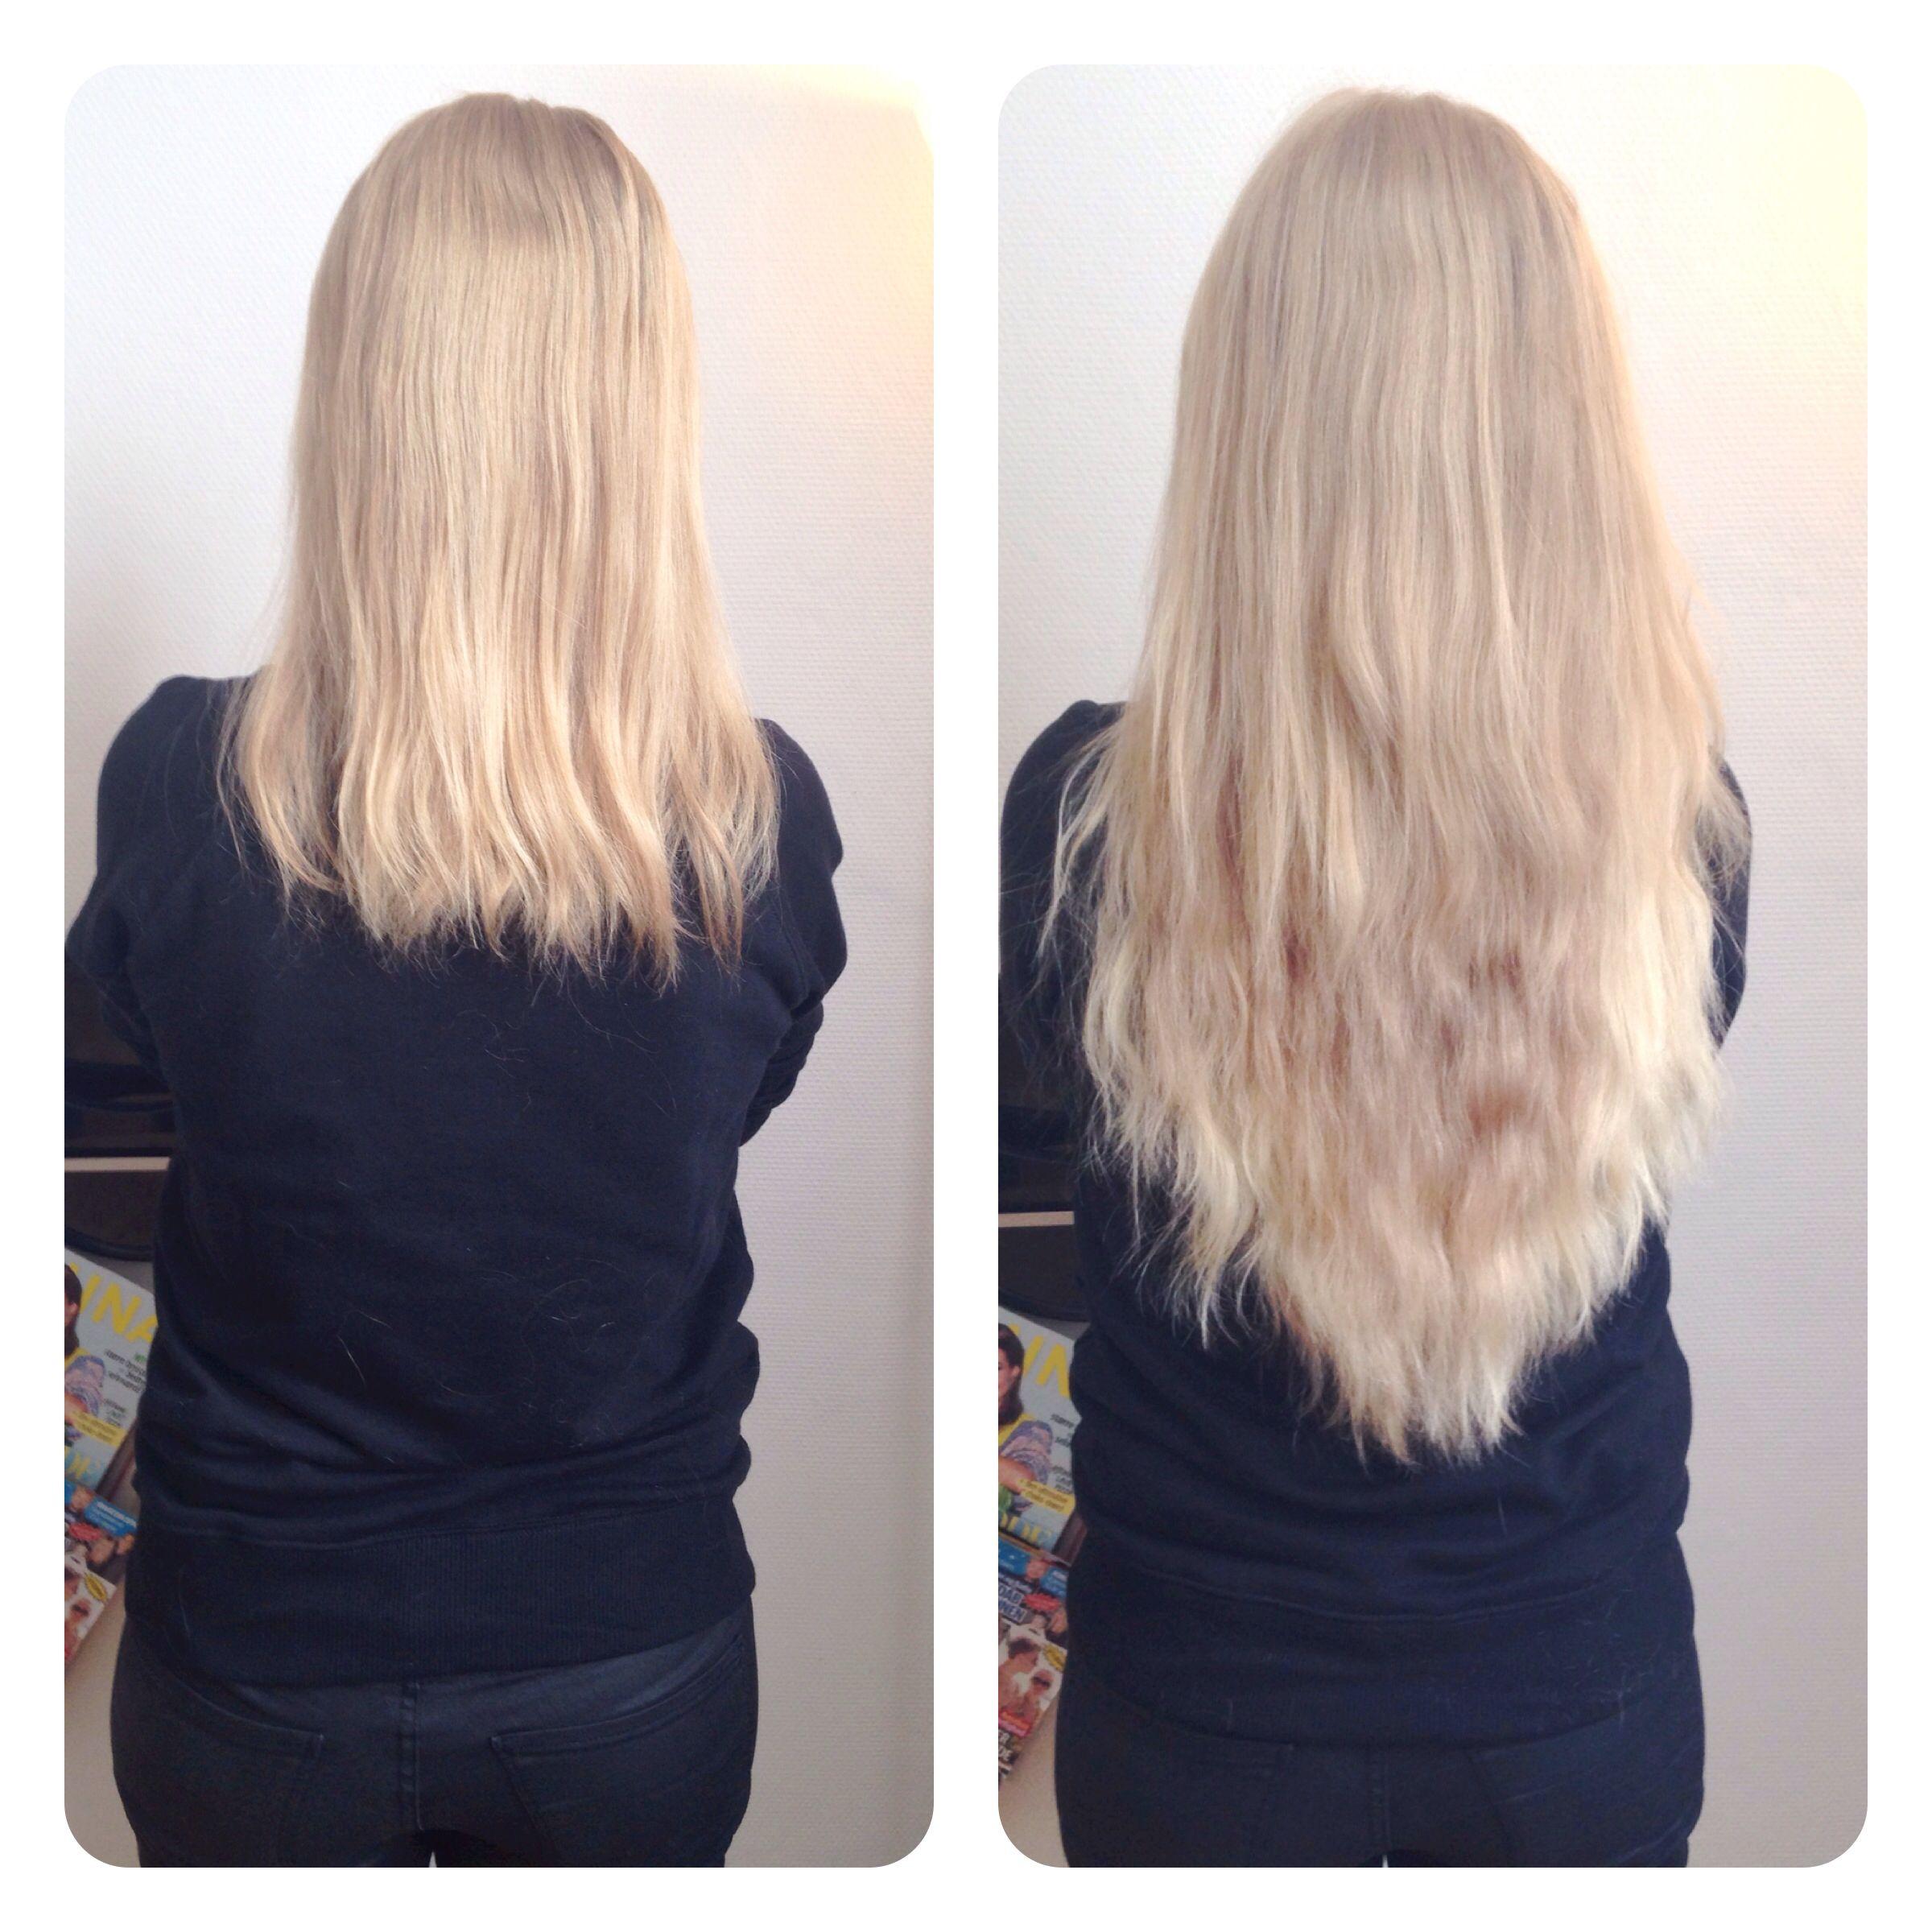 Ez Weft Hair Extension Hair Extensions Pinterest Hair